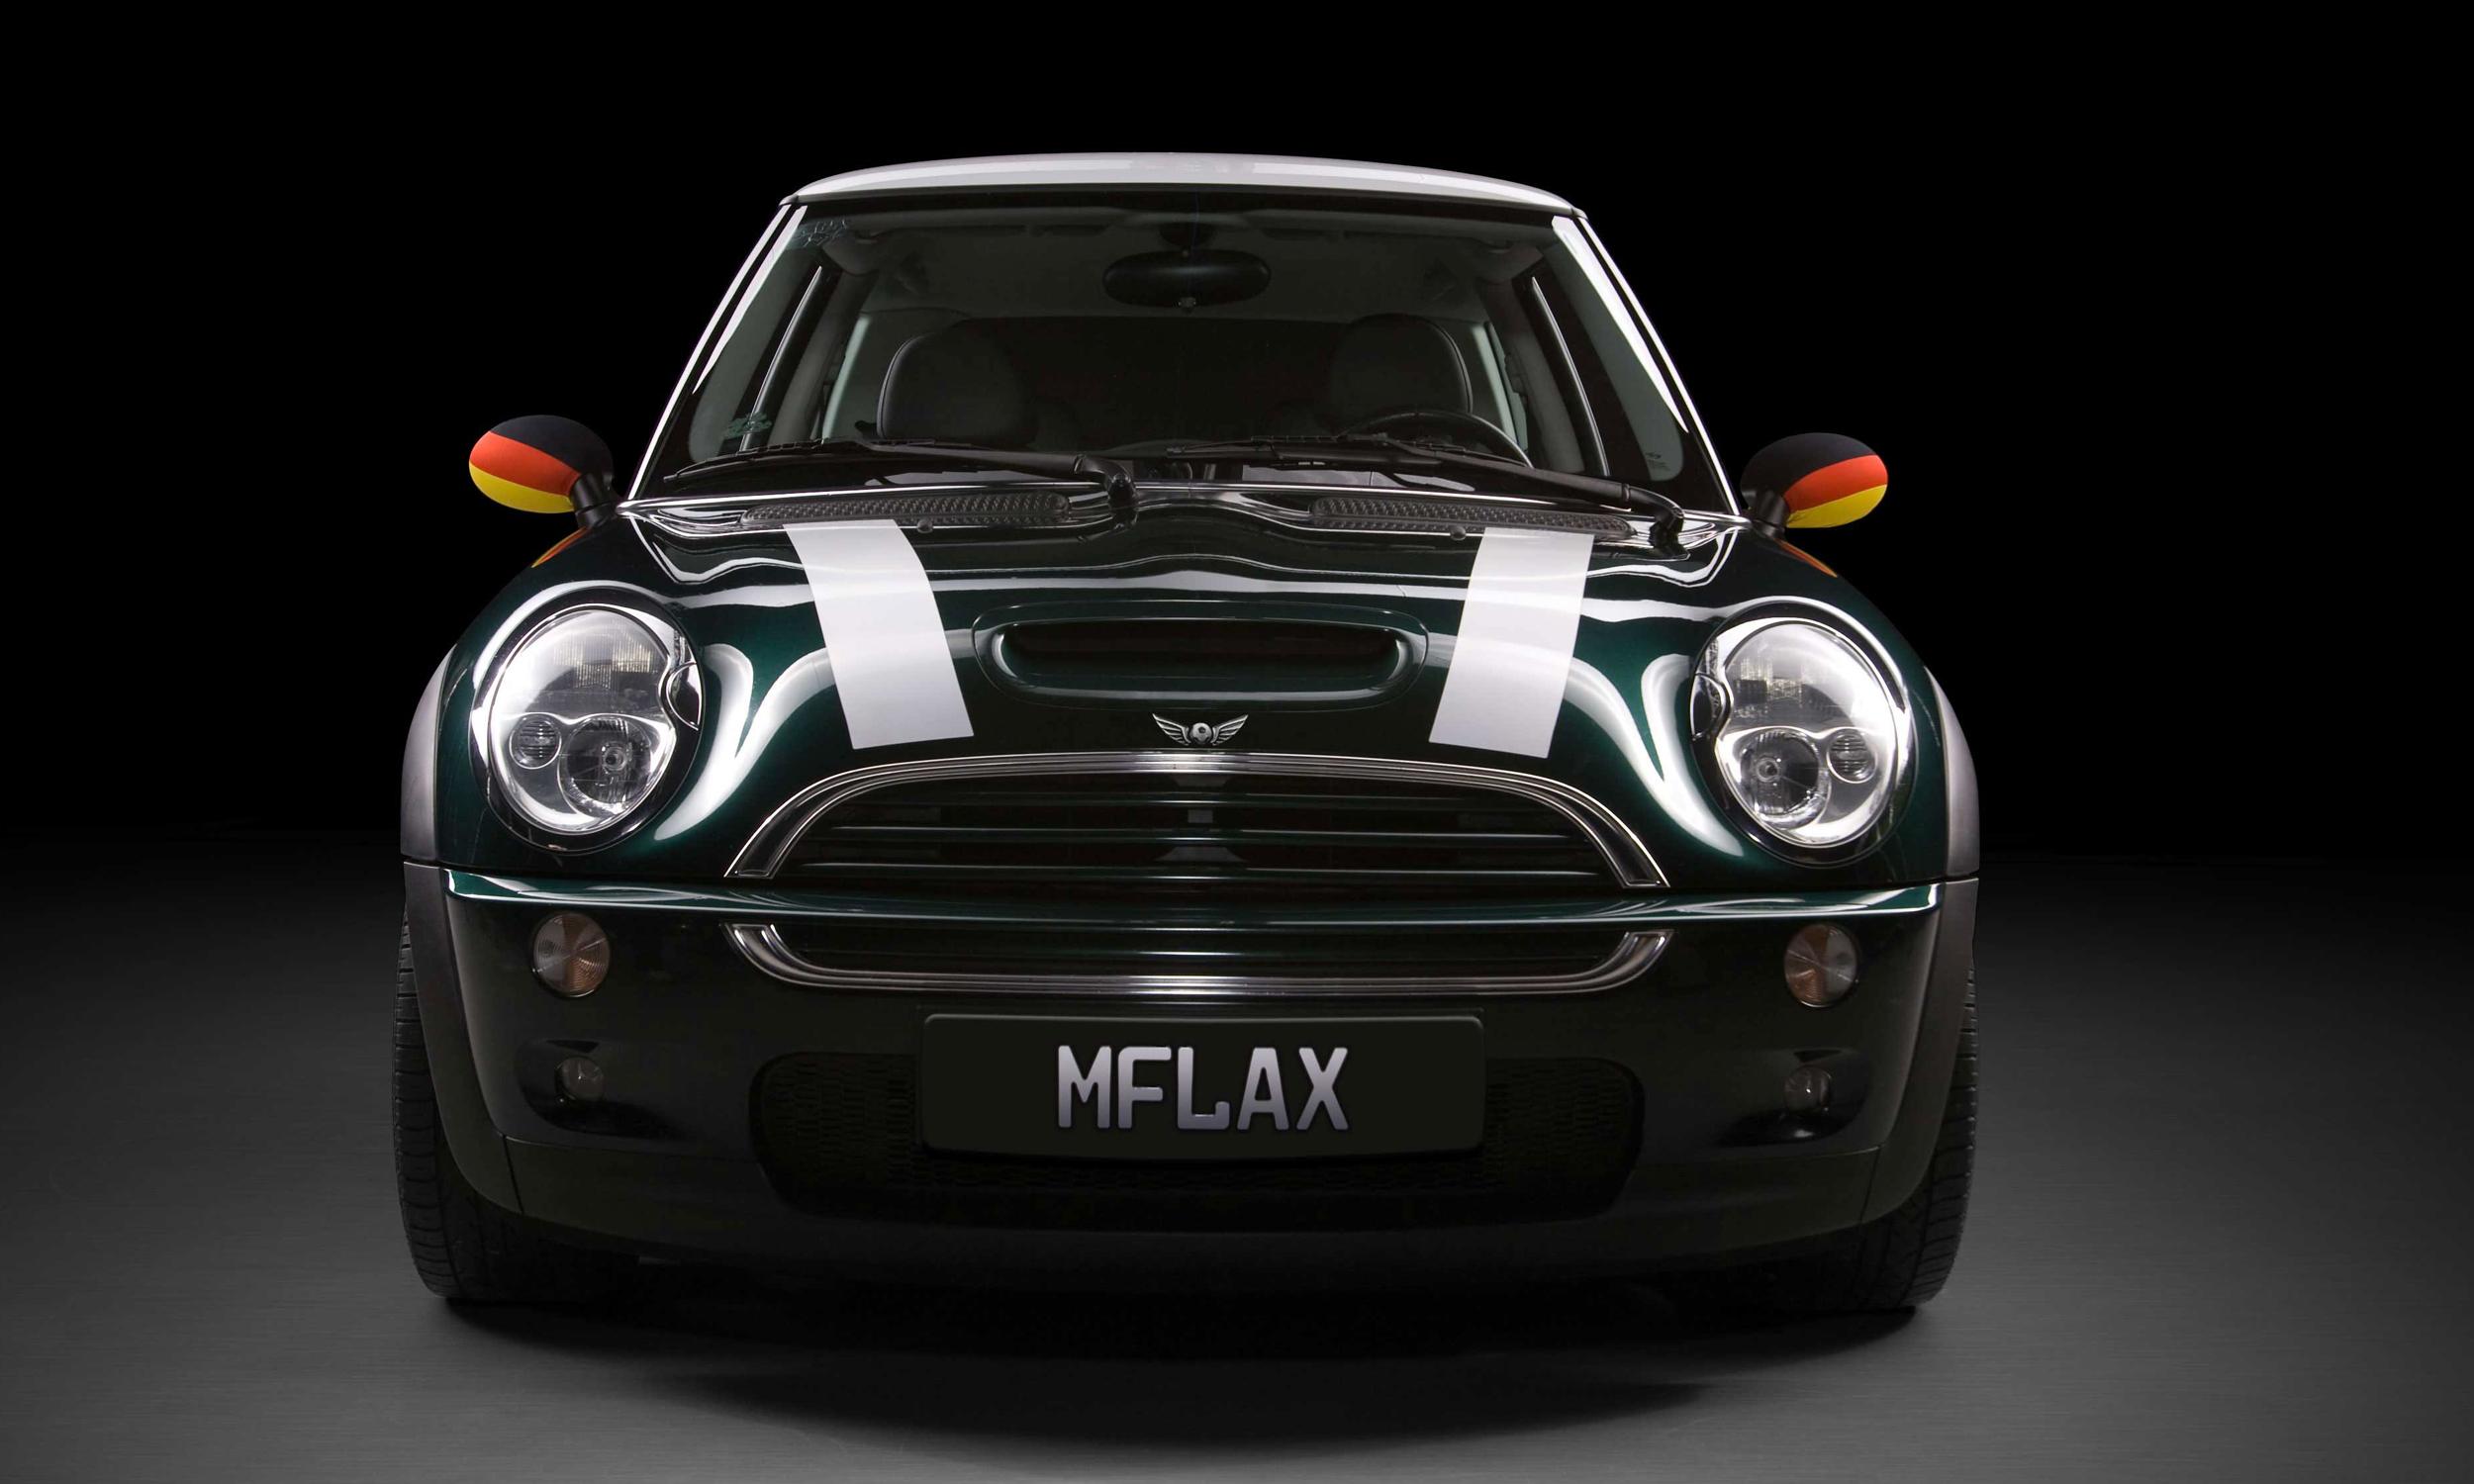 Commercial_Mflax_BMW_Mini.jpg